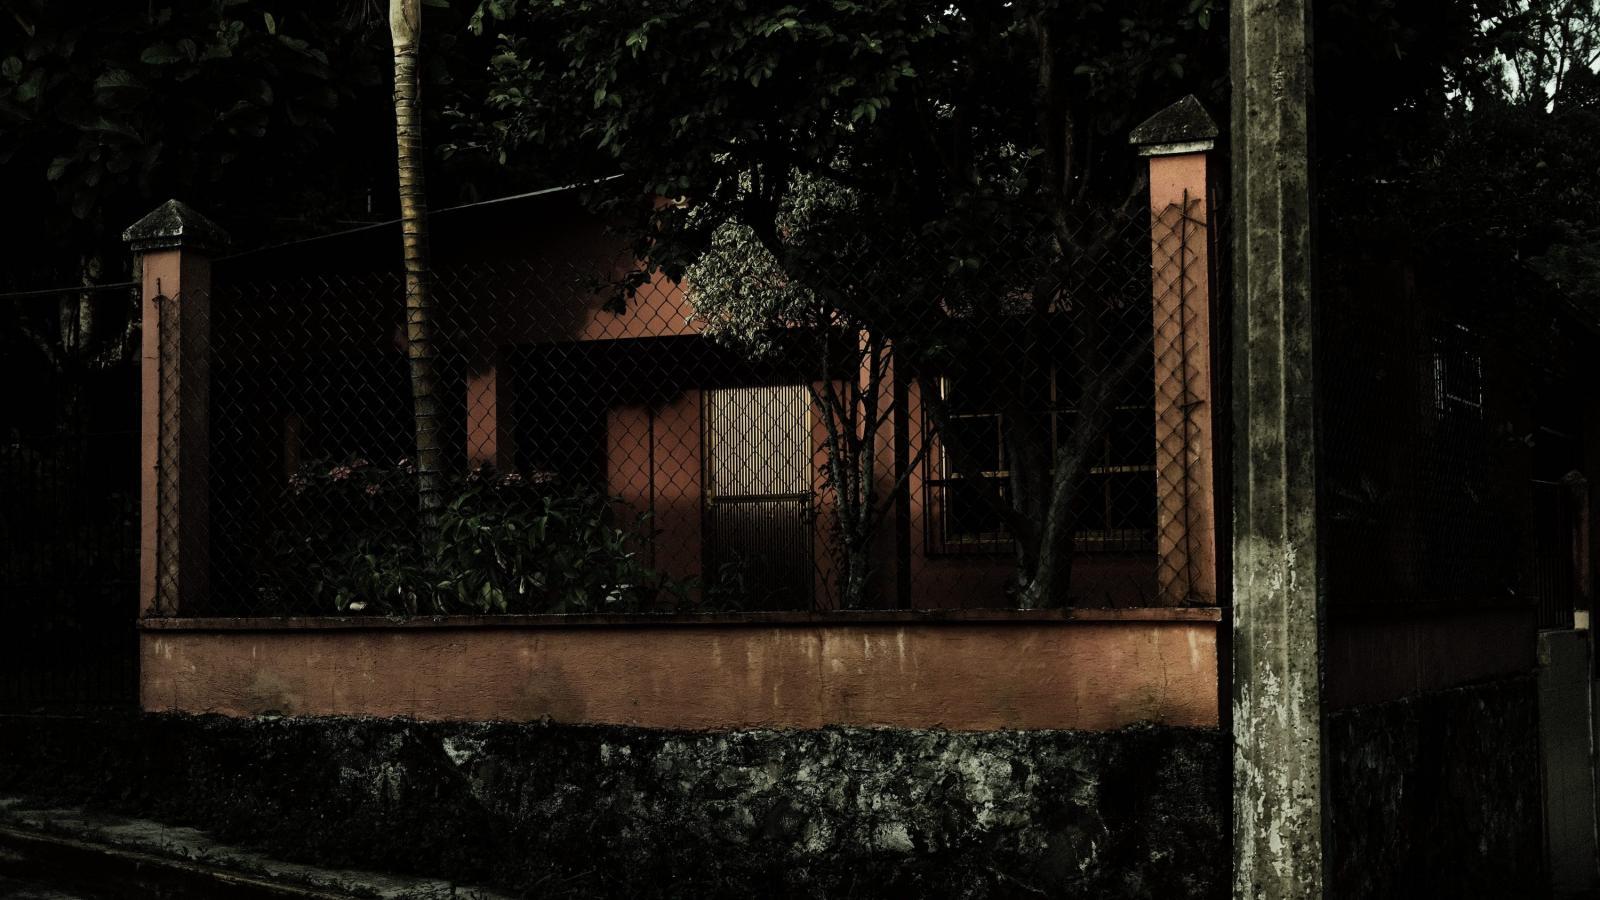 Photography image - Loading DSCF0419.JPG